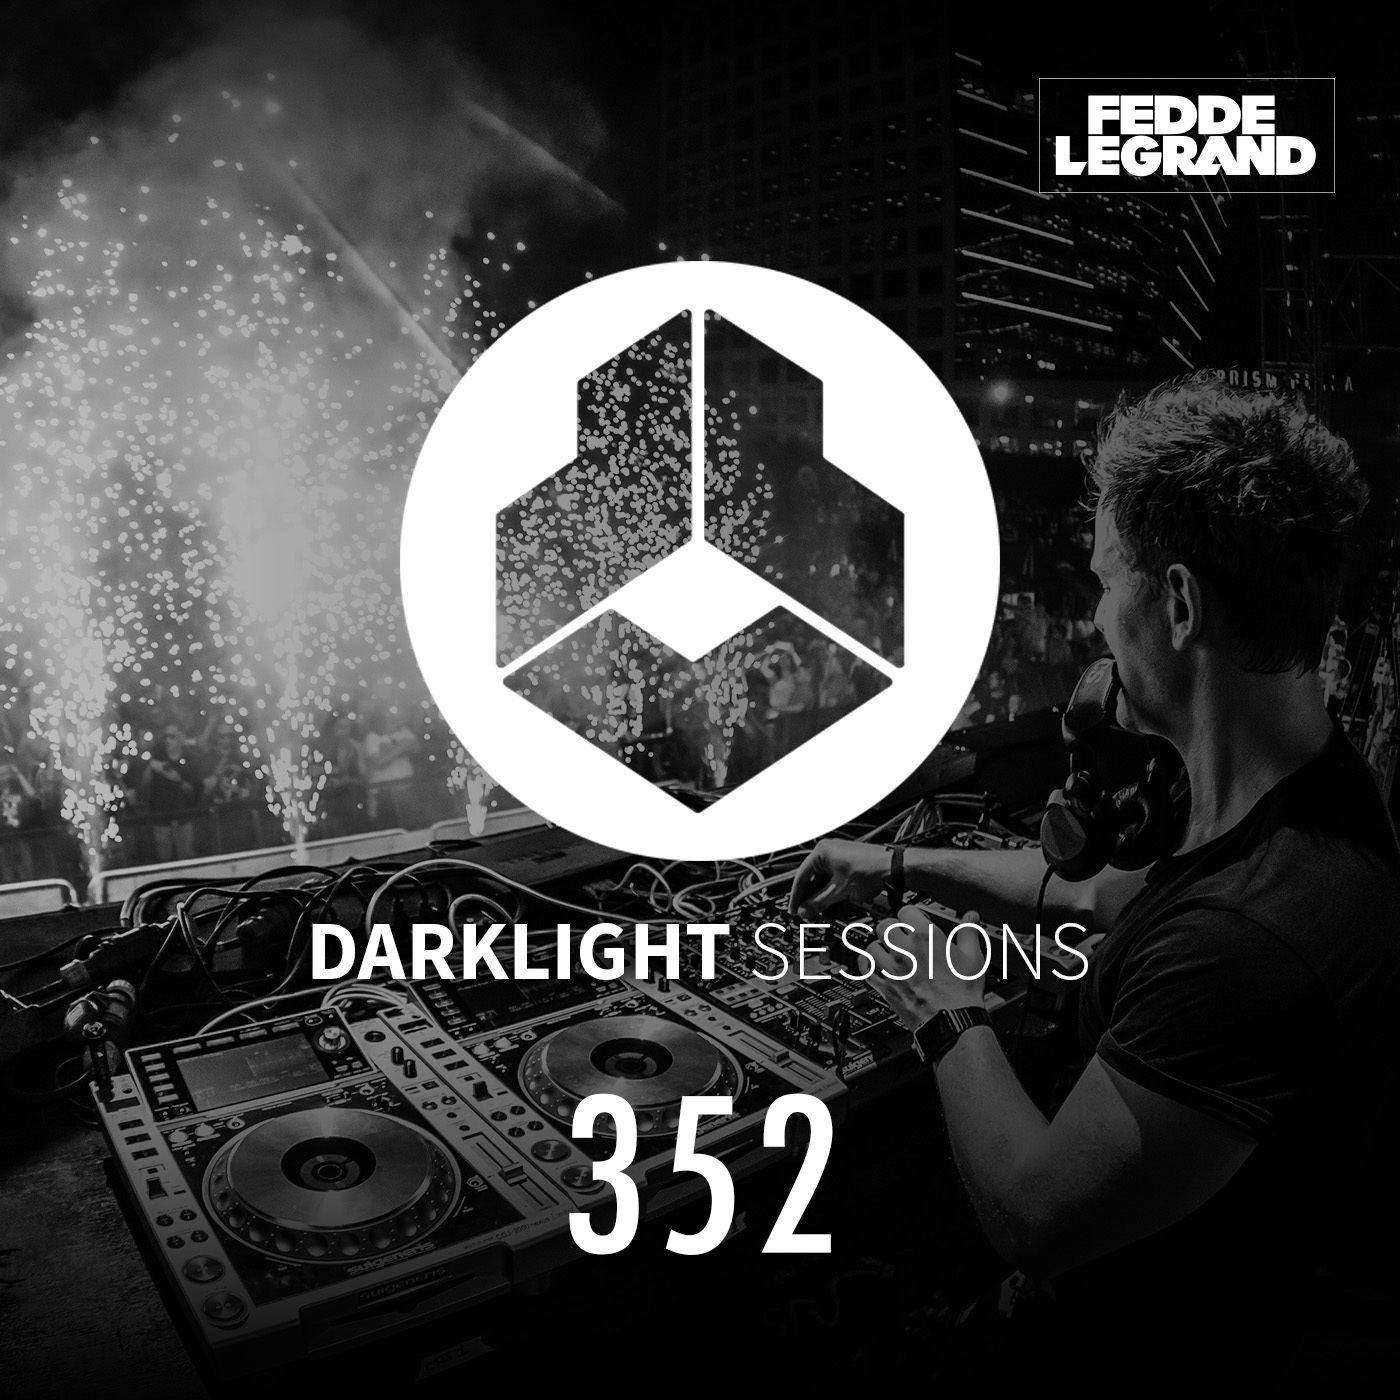 Darklight Sessions 352